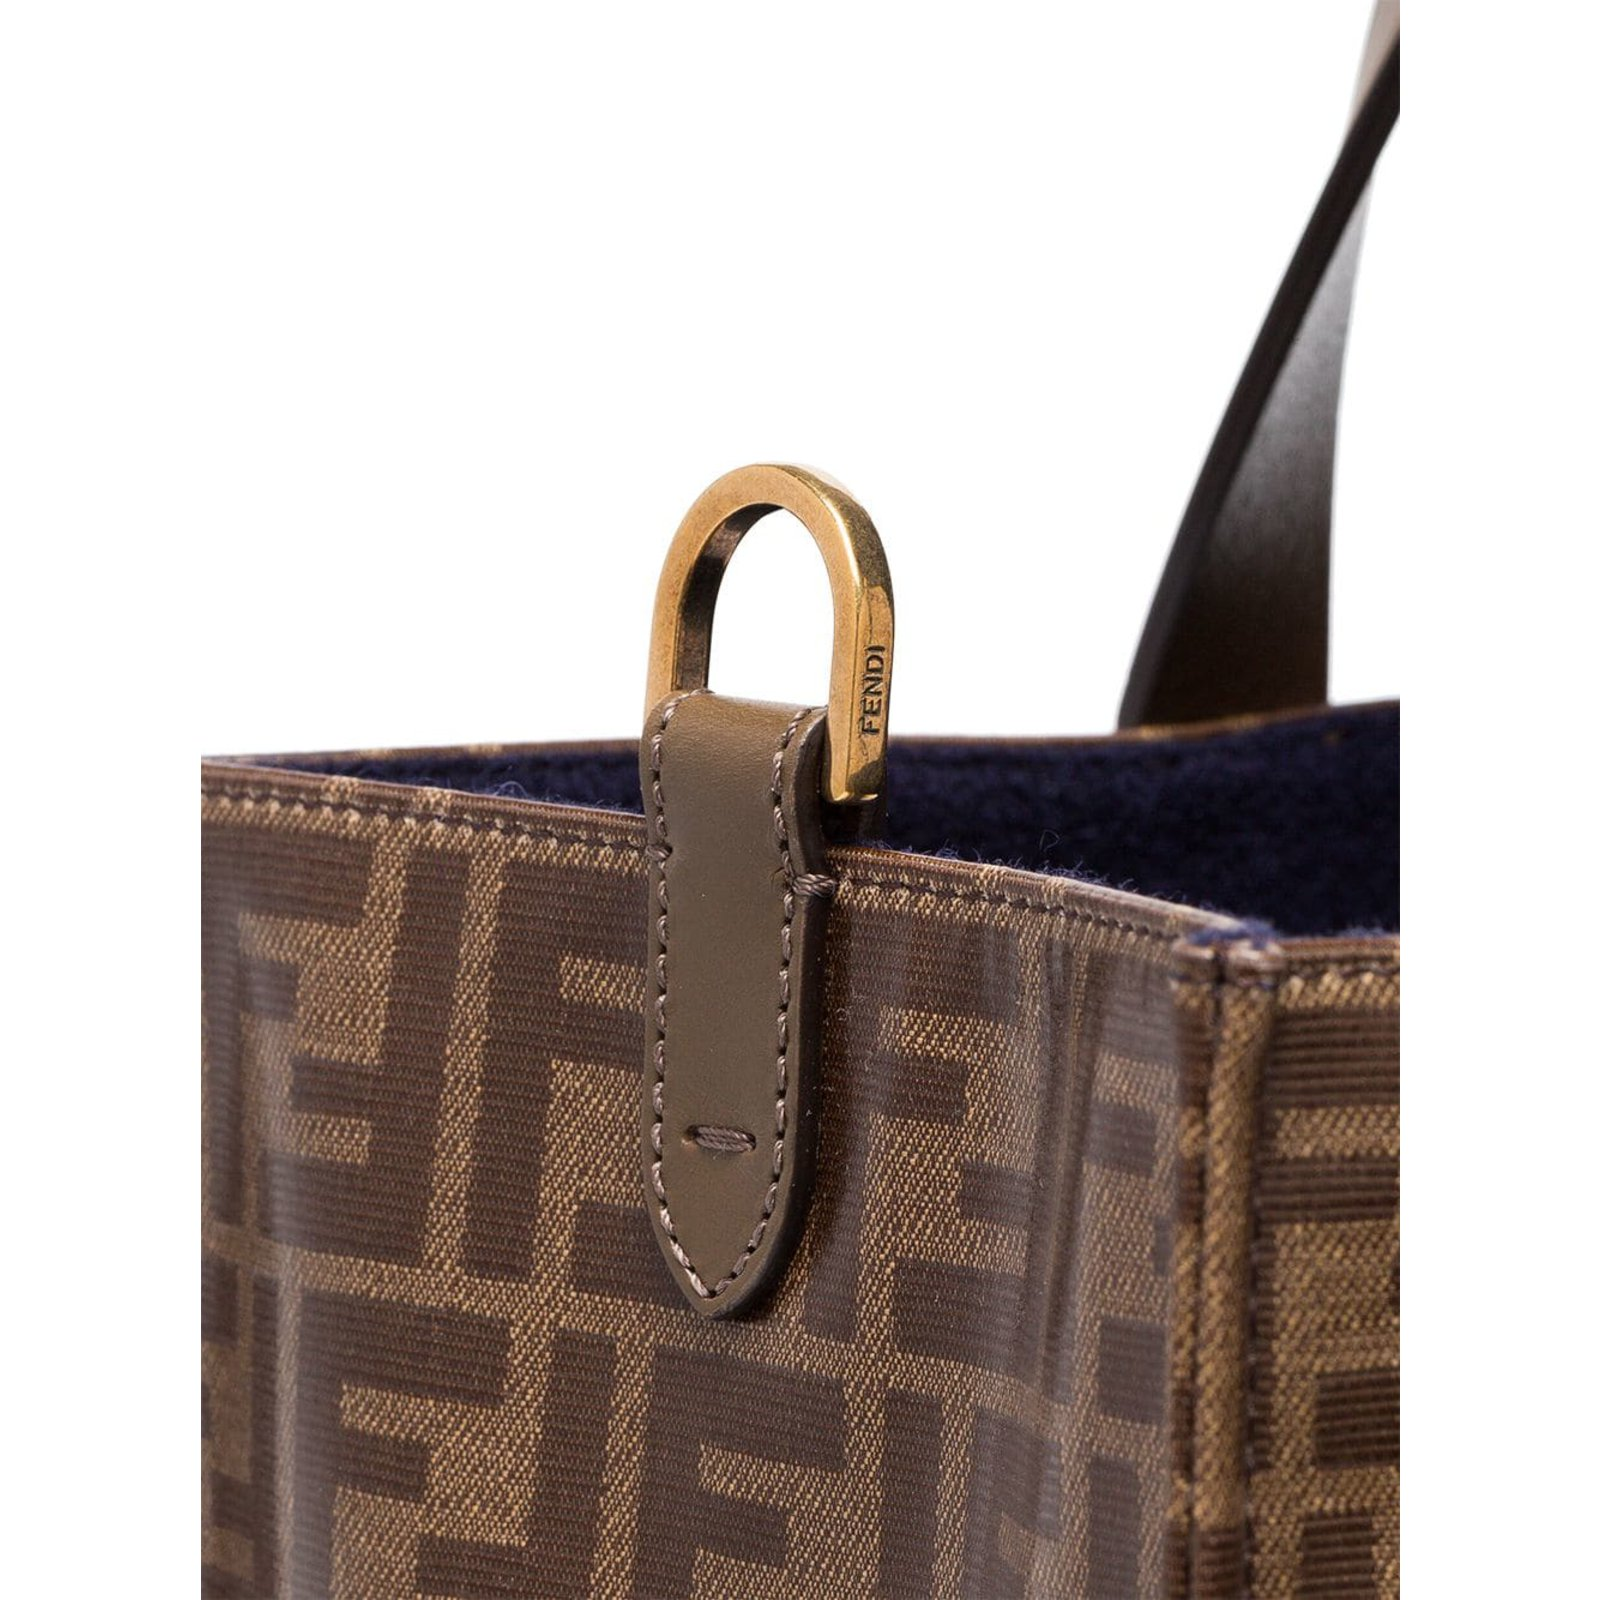 23ee0a4a93 Fendi Fendi Mania brown logo print tote bag Handbags Other Other ref.86523  - Joli Closet